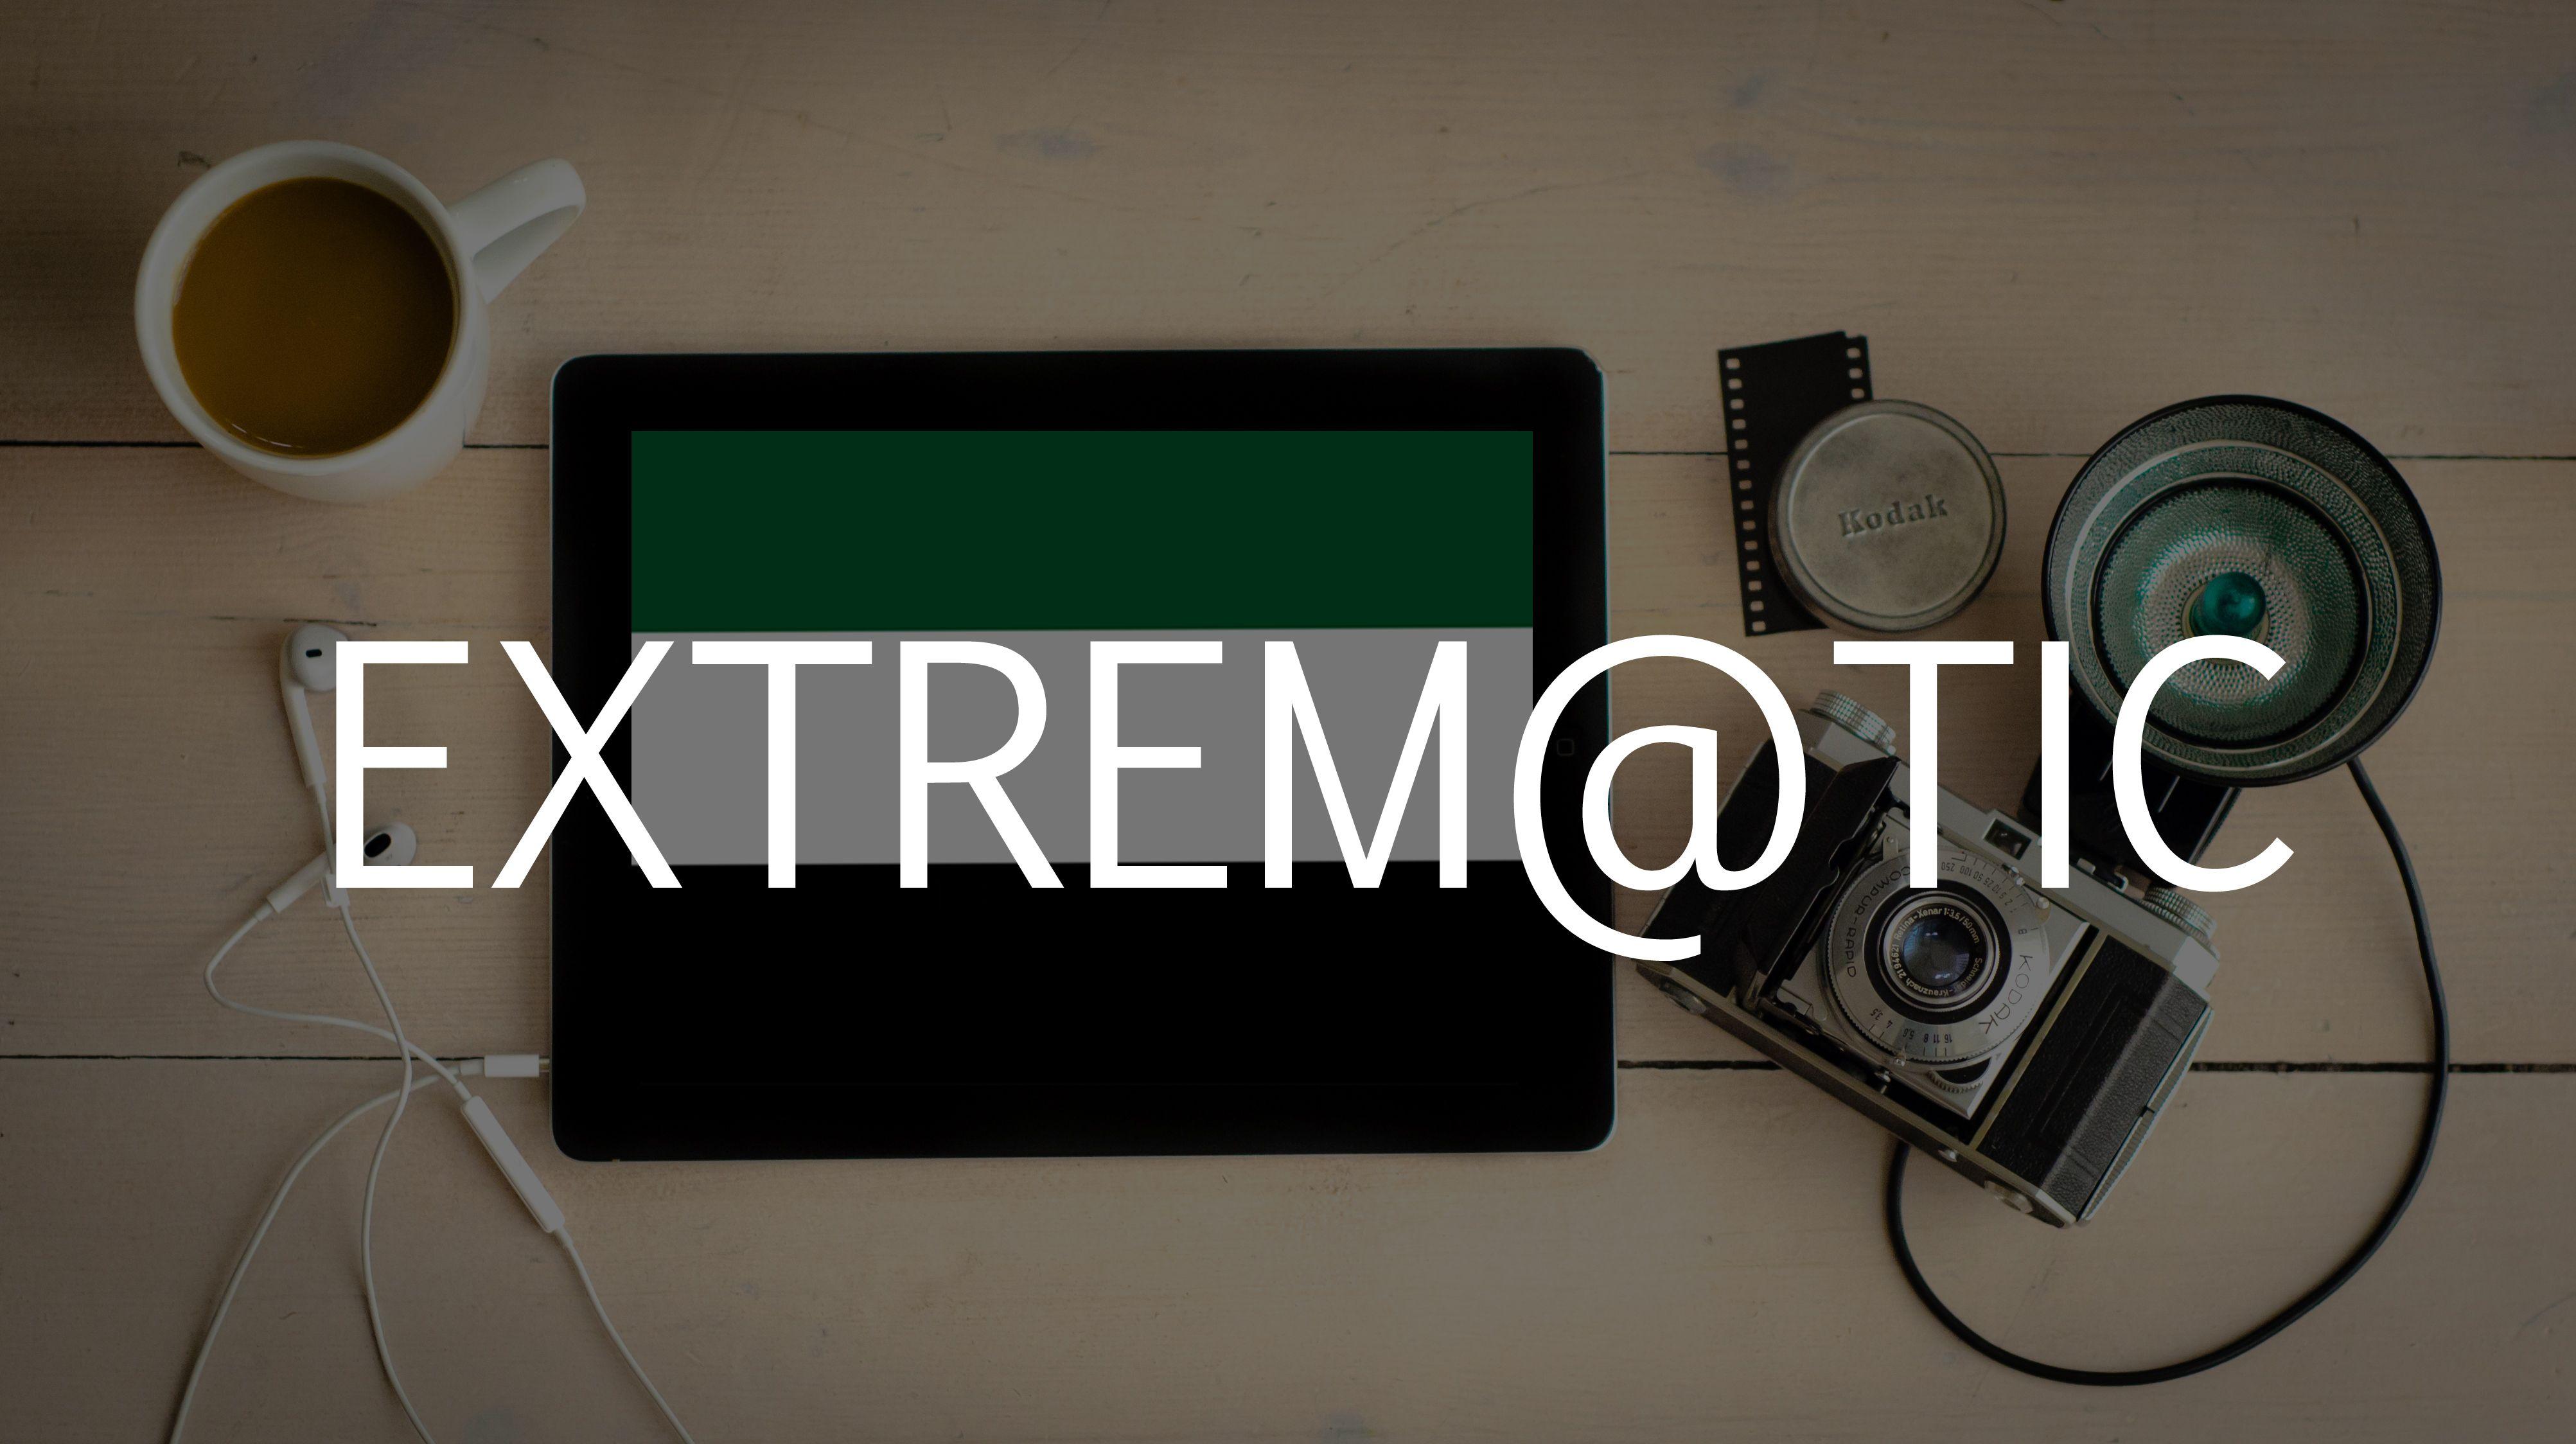 extrem@tic